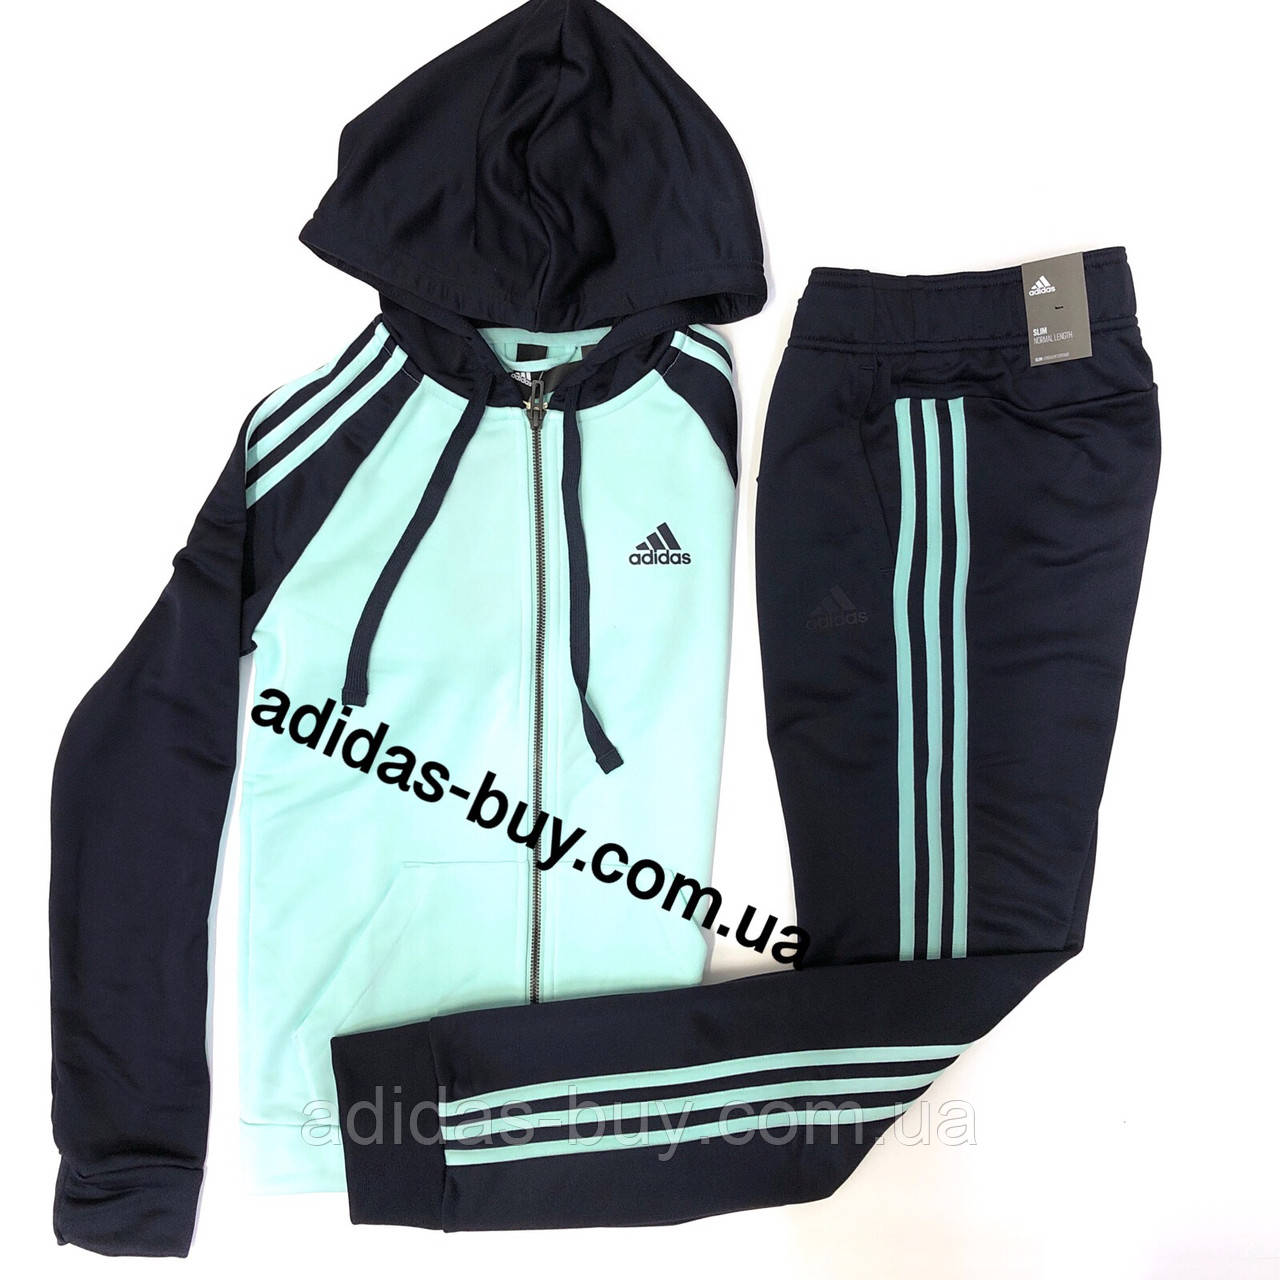 04e39dbb36f Женский костюм оригинал adidas Re-Focus DN8527 сезон весна цвет синий  бирюзовый -